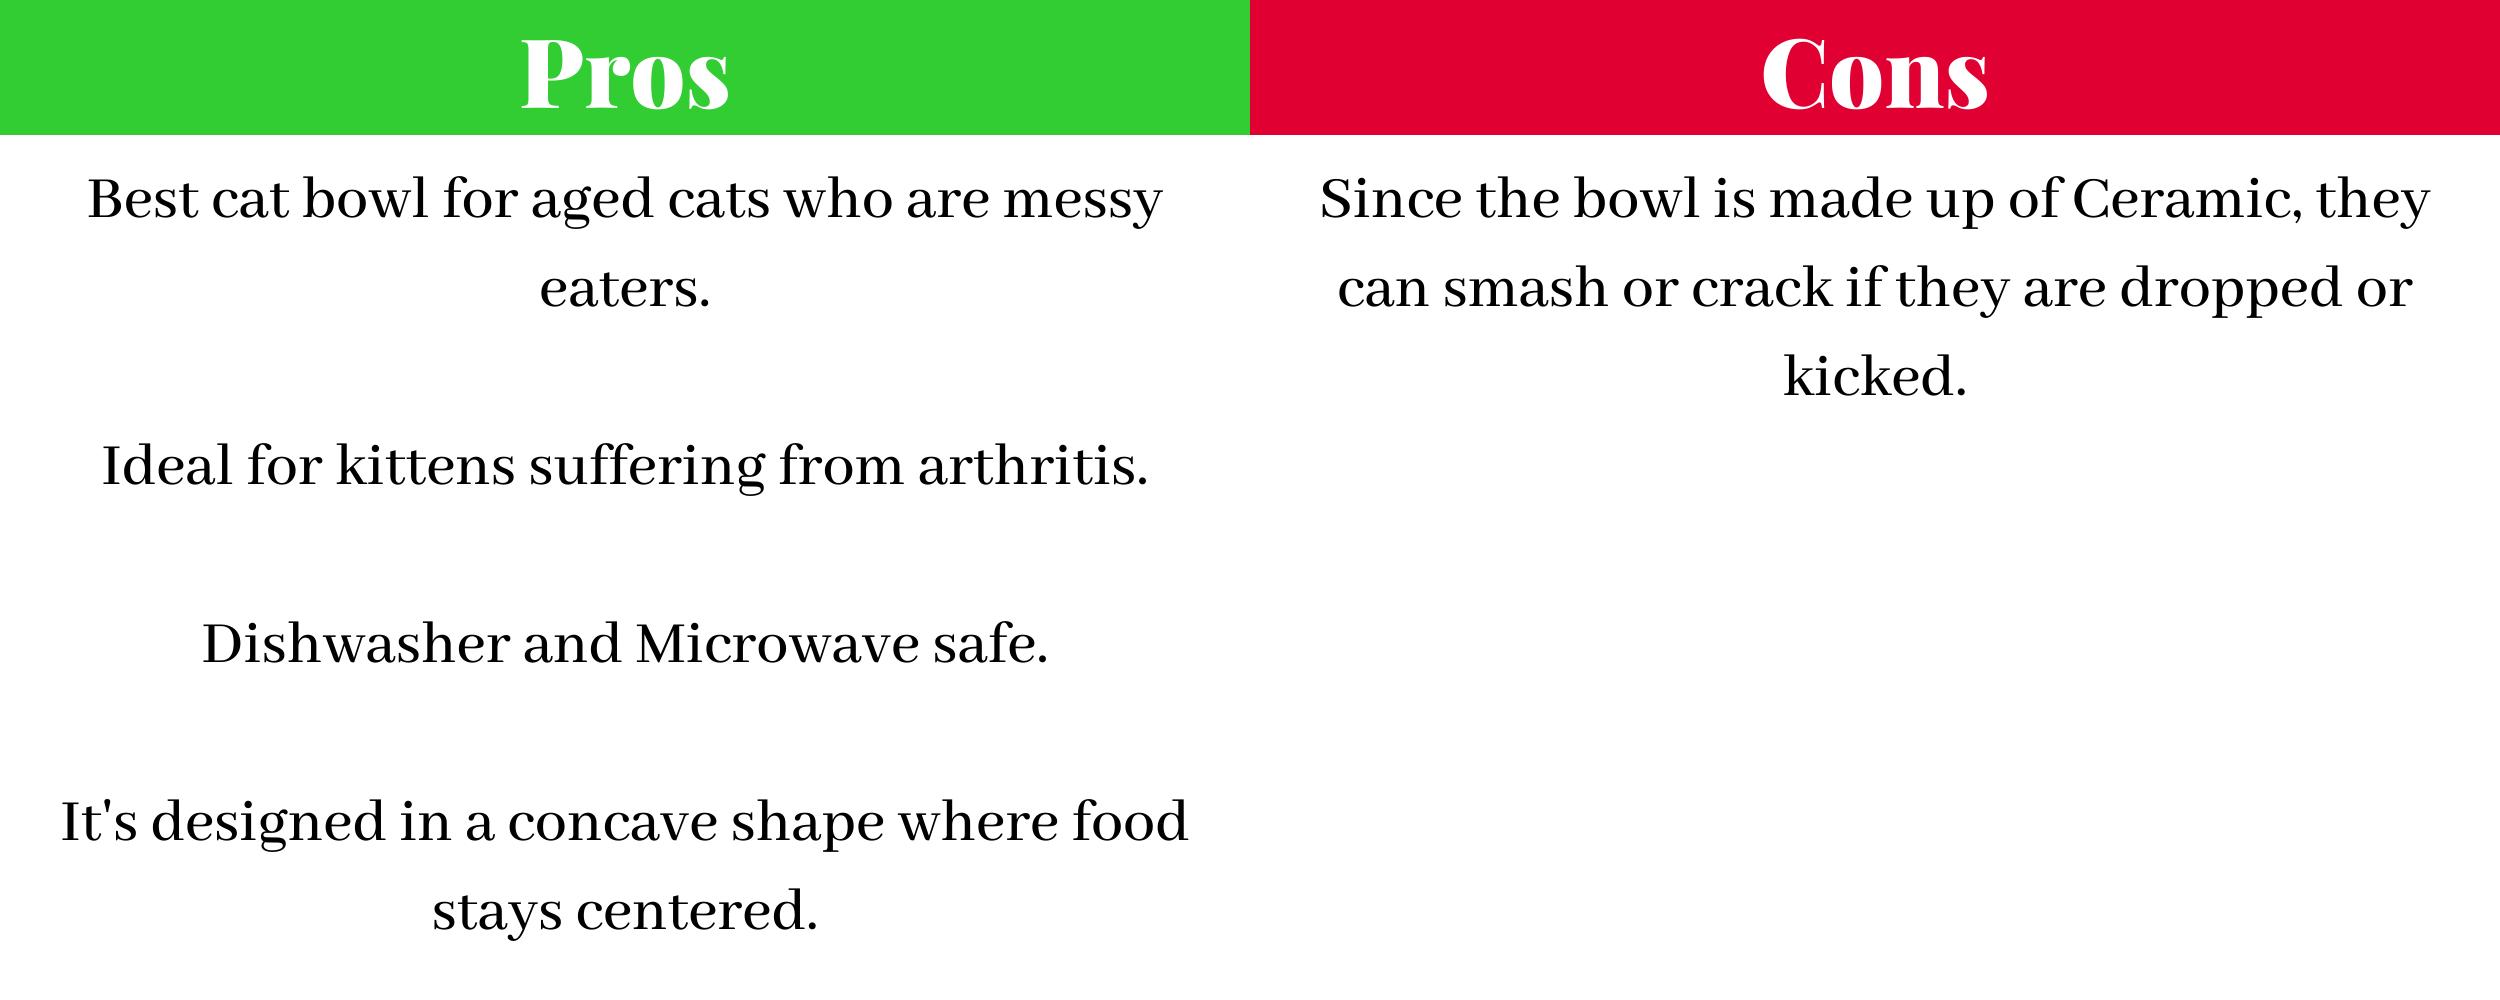 Pros and Cons of Necoichi Raised Cat Food Bowl